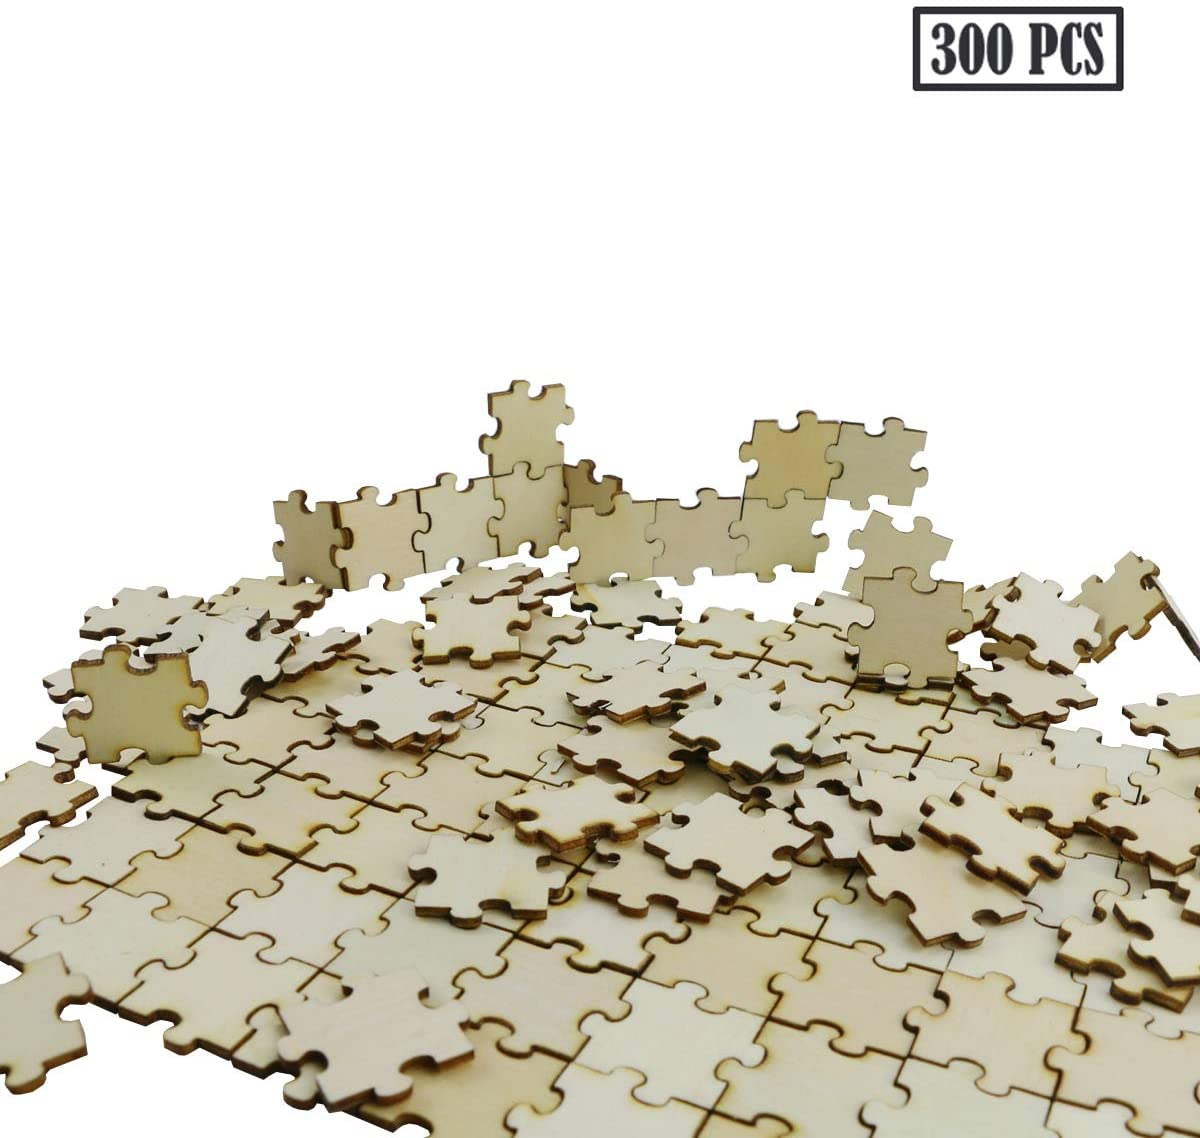 Blank Wooden DIY Jigsaw Puzzle